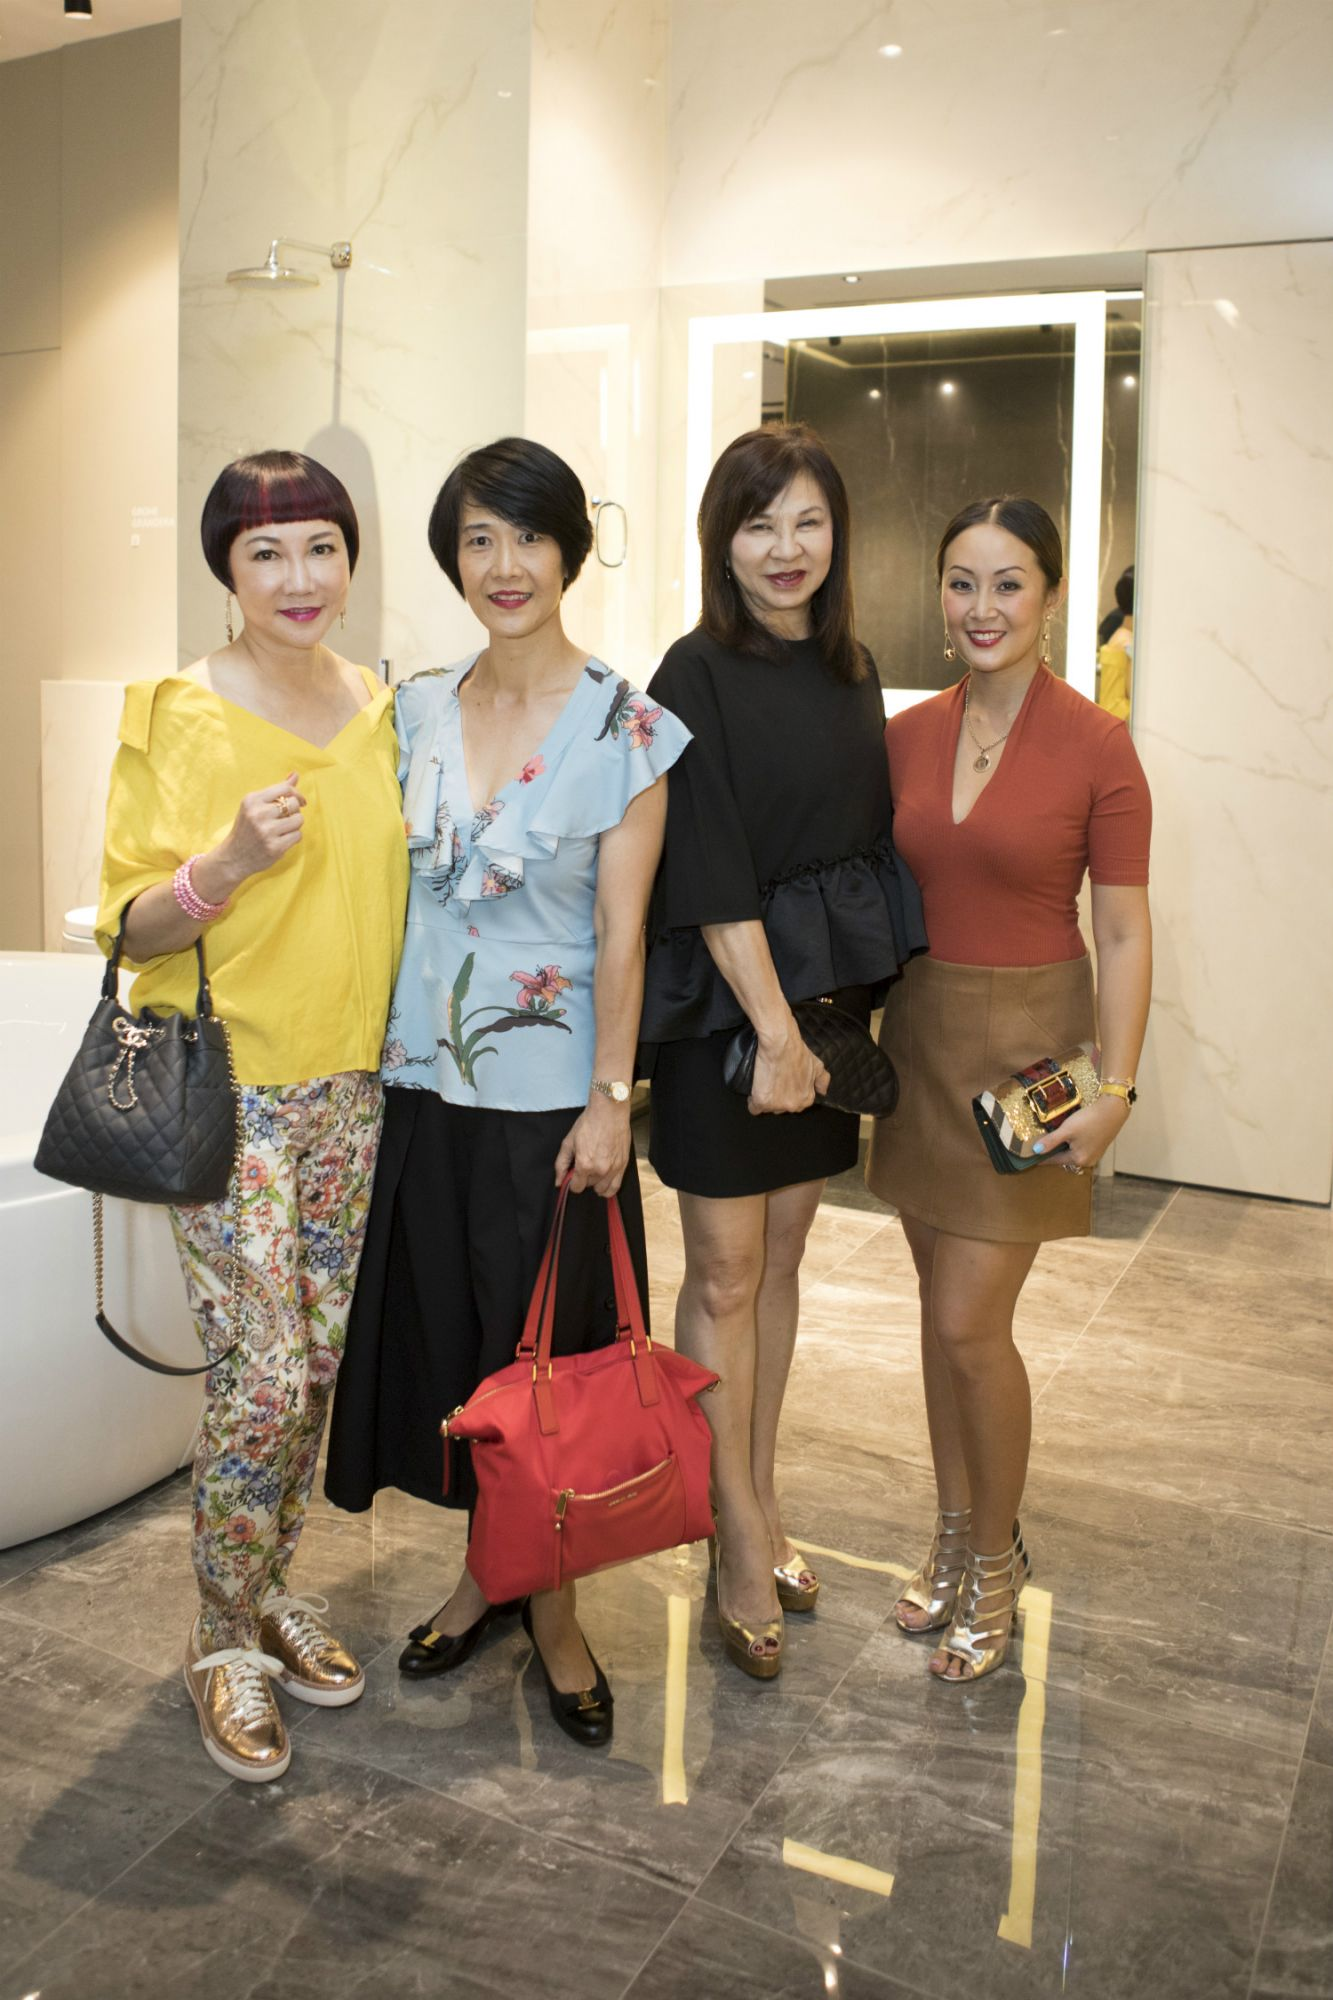 Frances Low, Christina Lim, Violet Yeo, Serene Chua